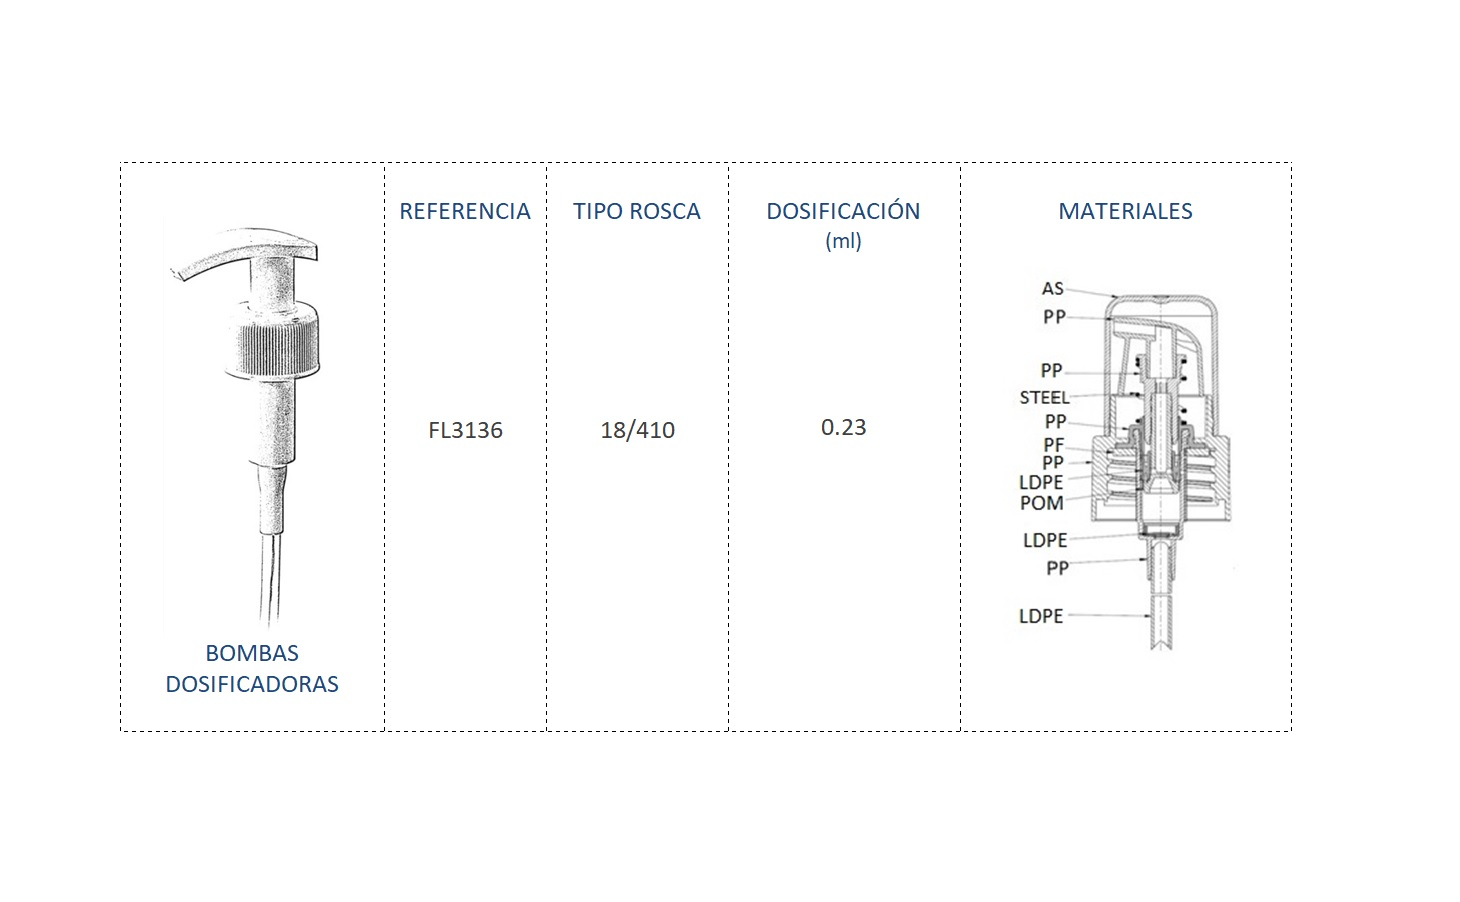 Cuadro de materiales bomba dosificadora FL3136 18/410